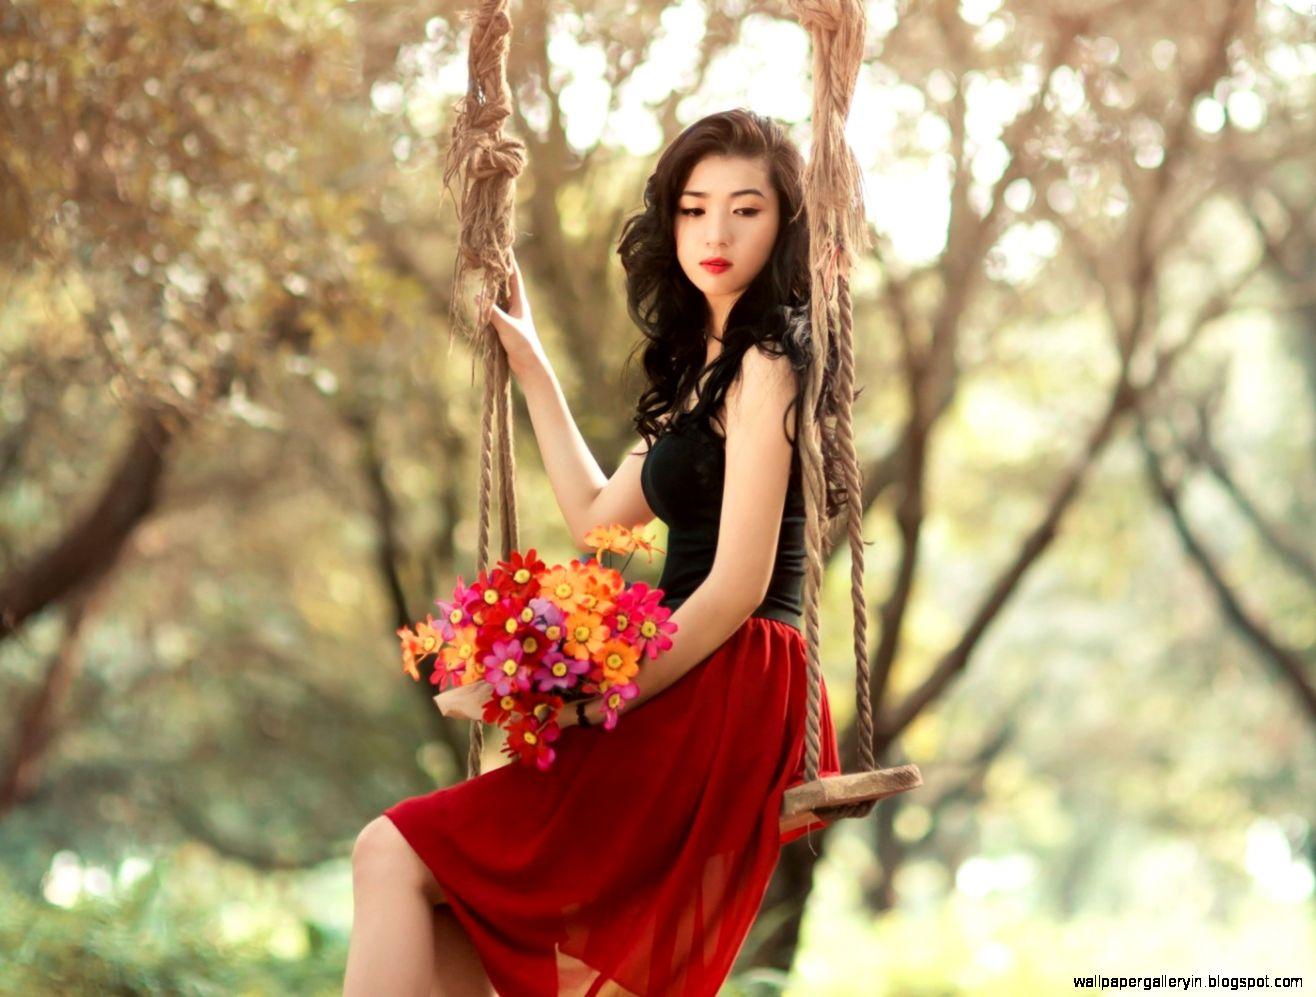 swing girl asian photography wallpaper | wallpaper gallery